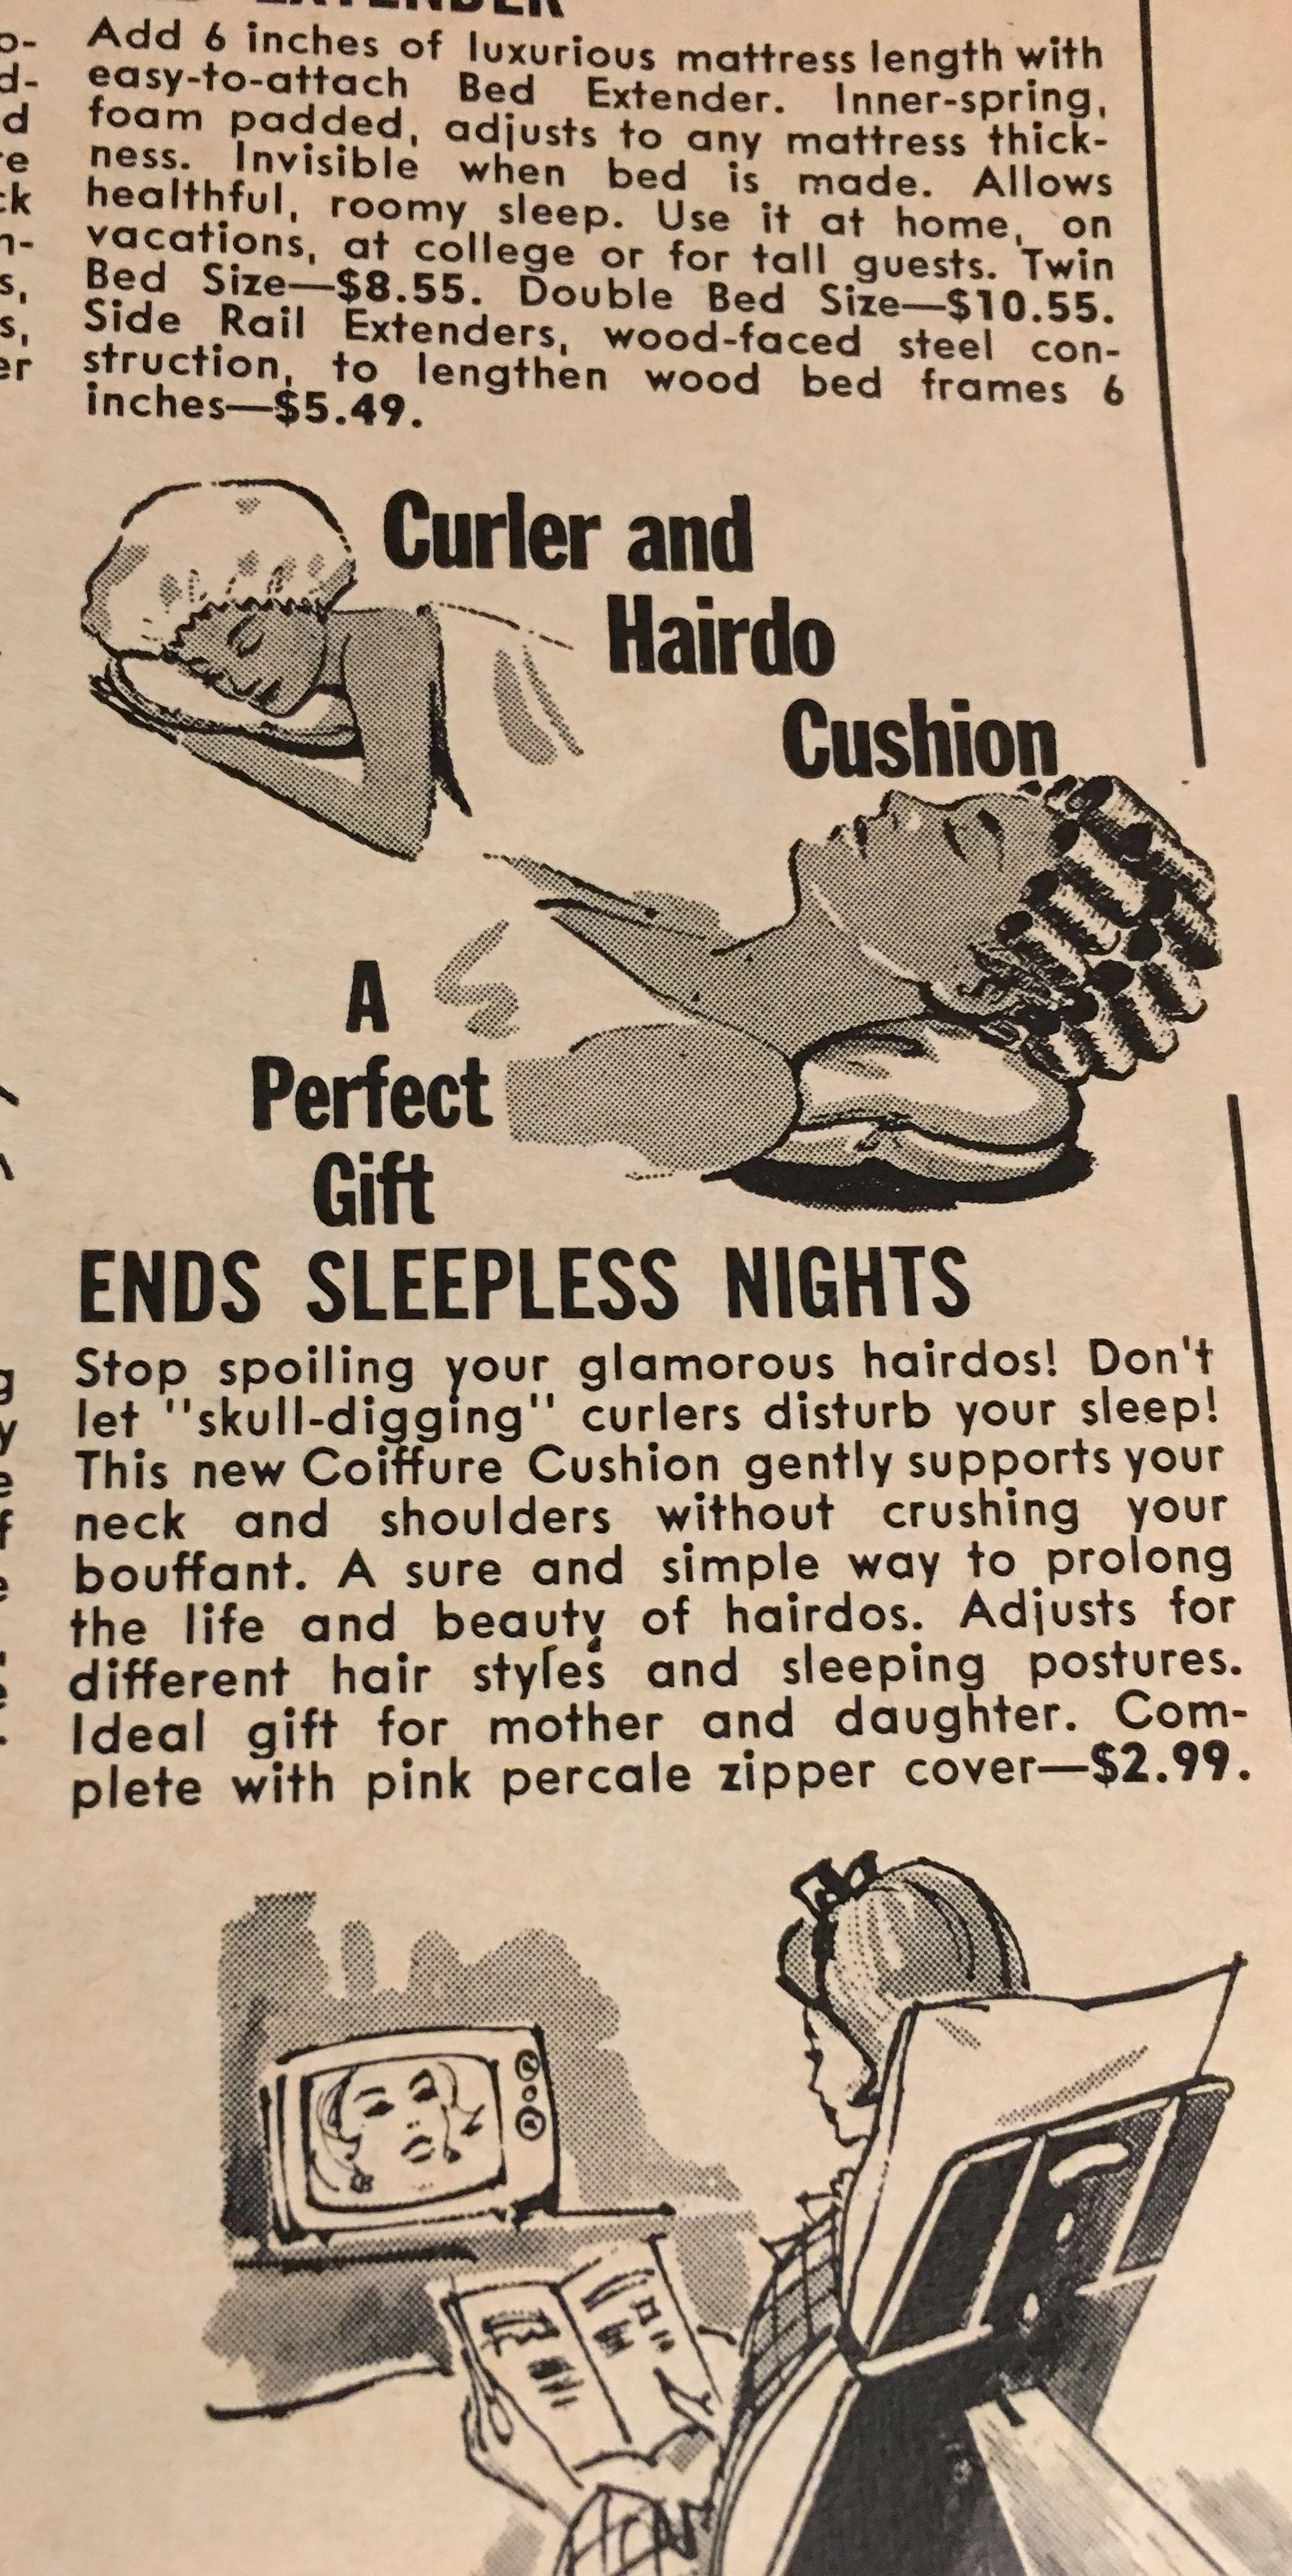 Pin by Jessica Lindsey on magazine ads Bed mattress